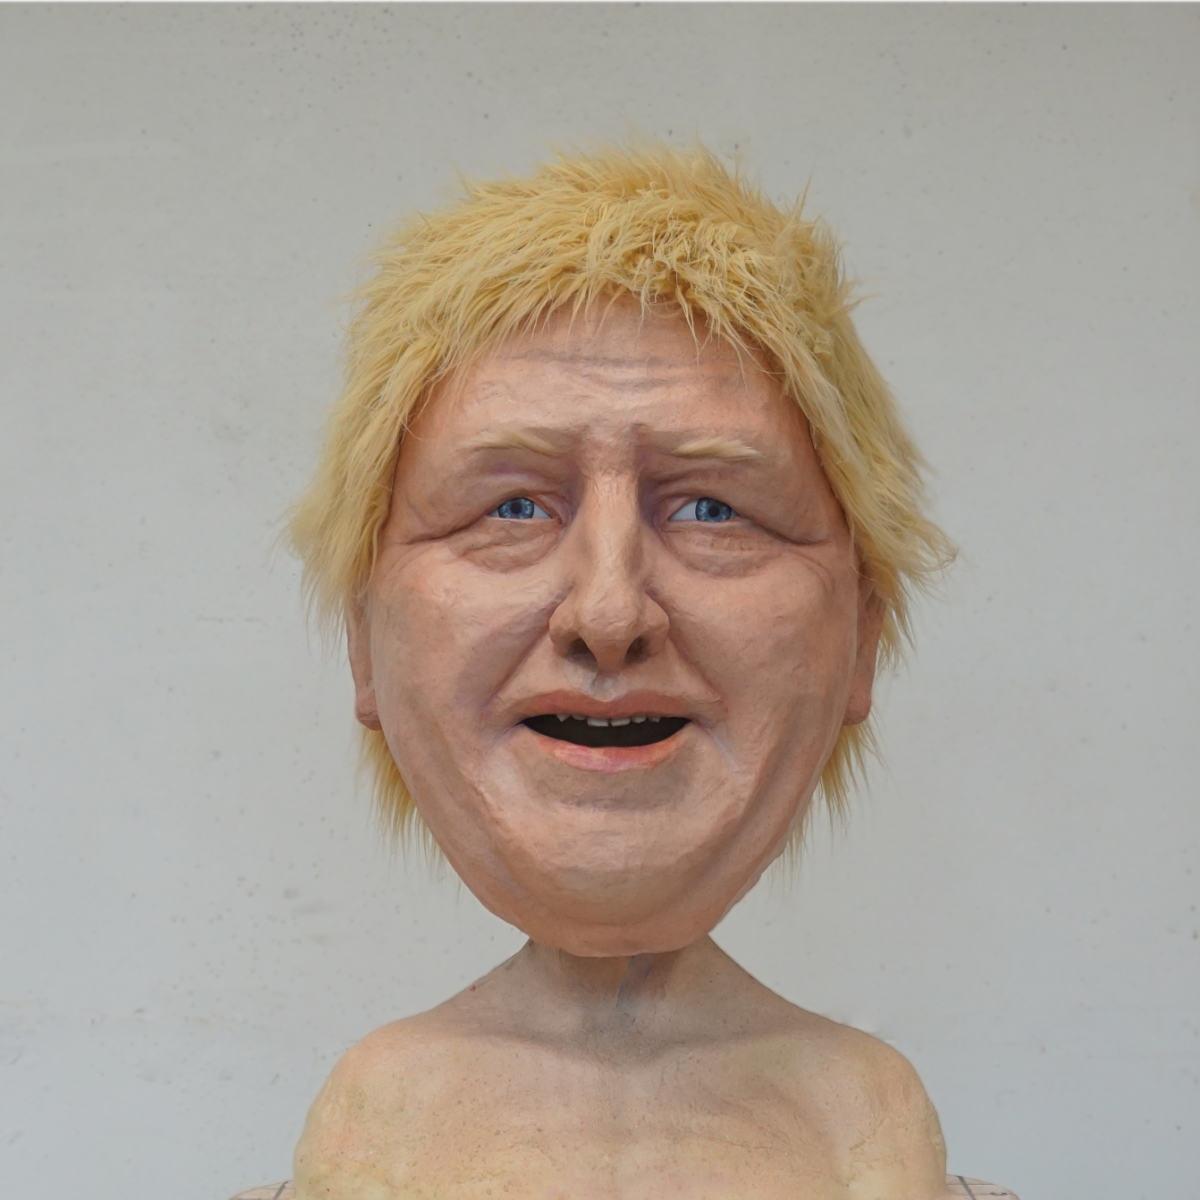 Greenpeace Boris Johnson Mask